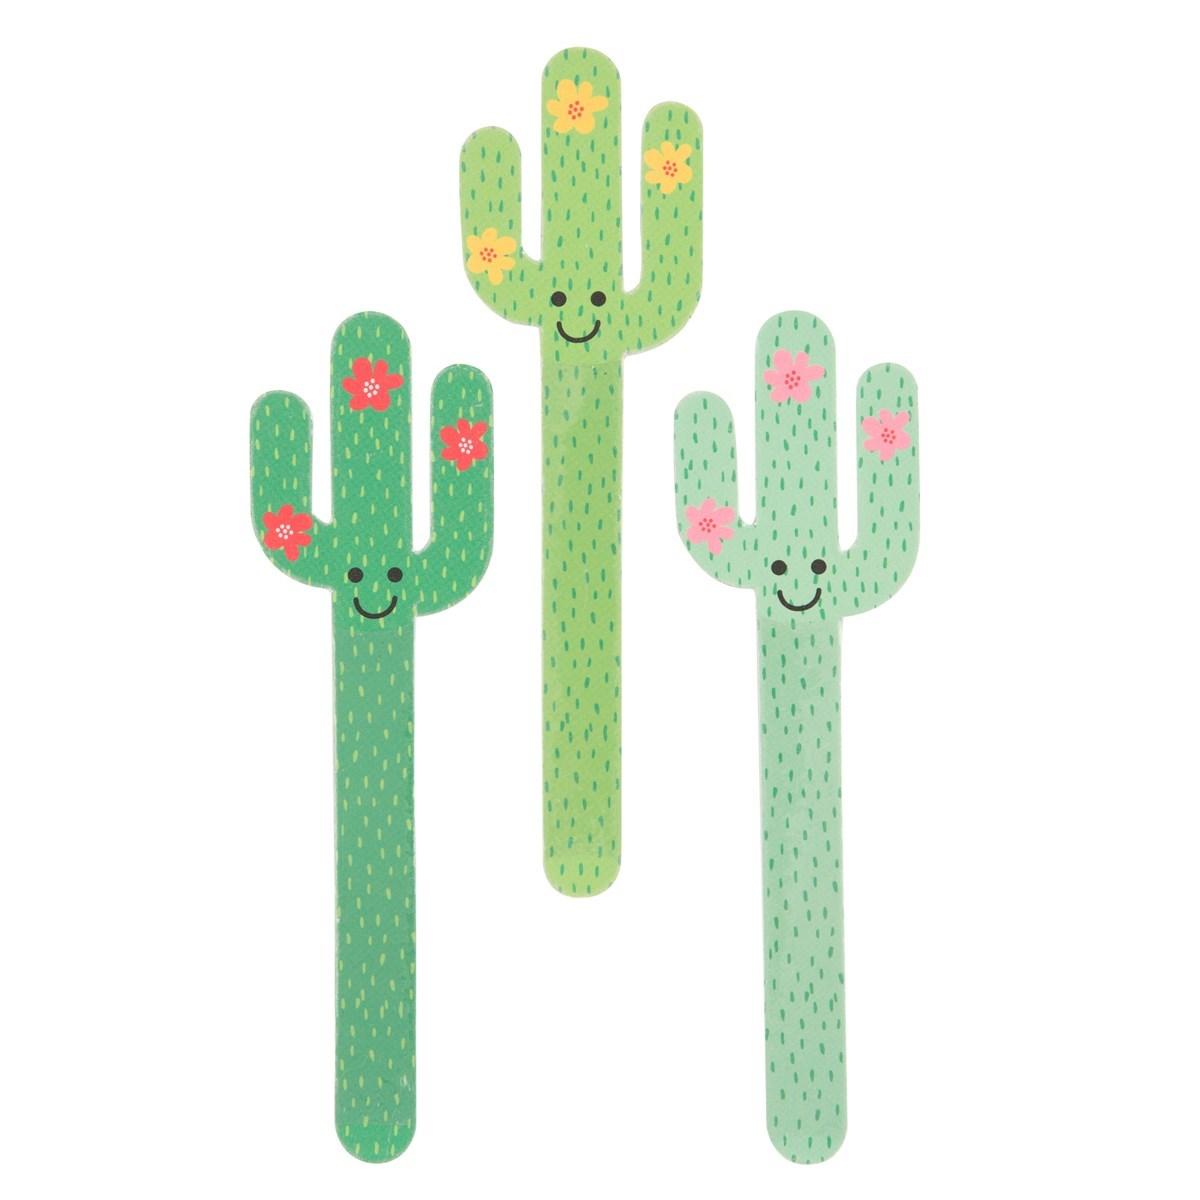 Colorful Cactus Nail File Alternative Image 1